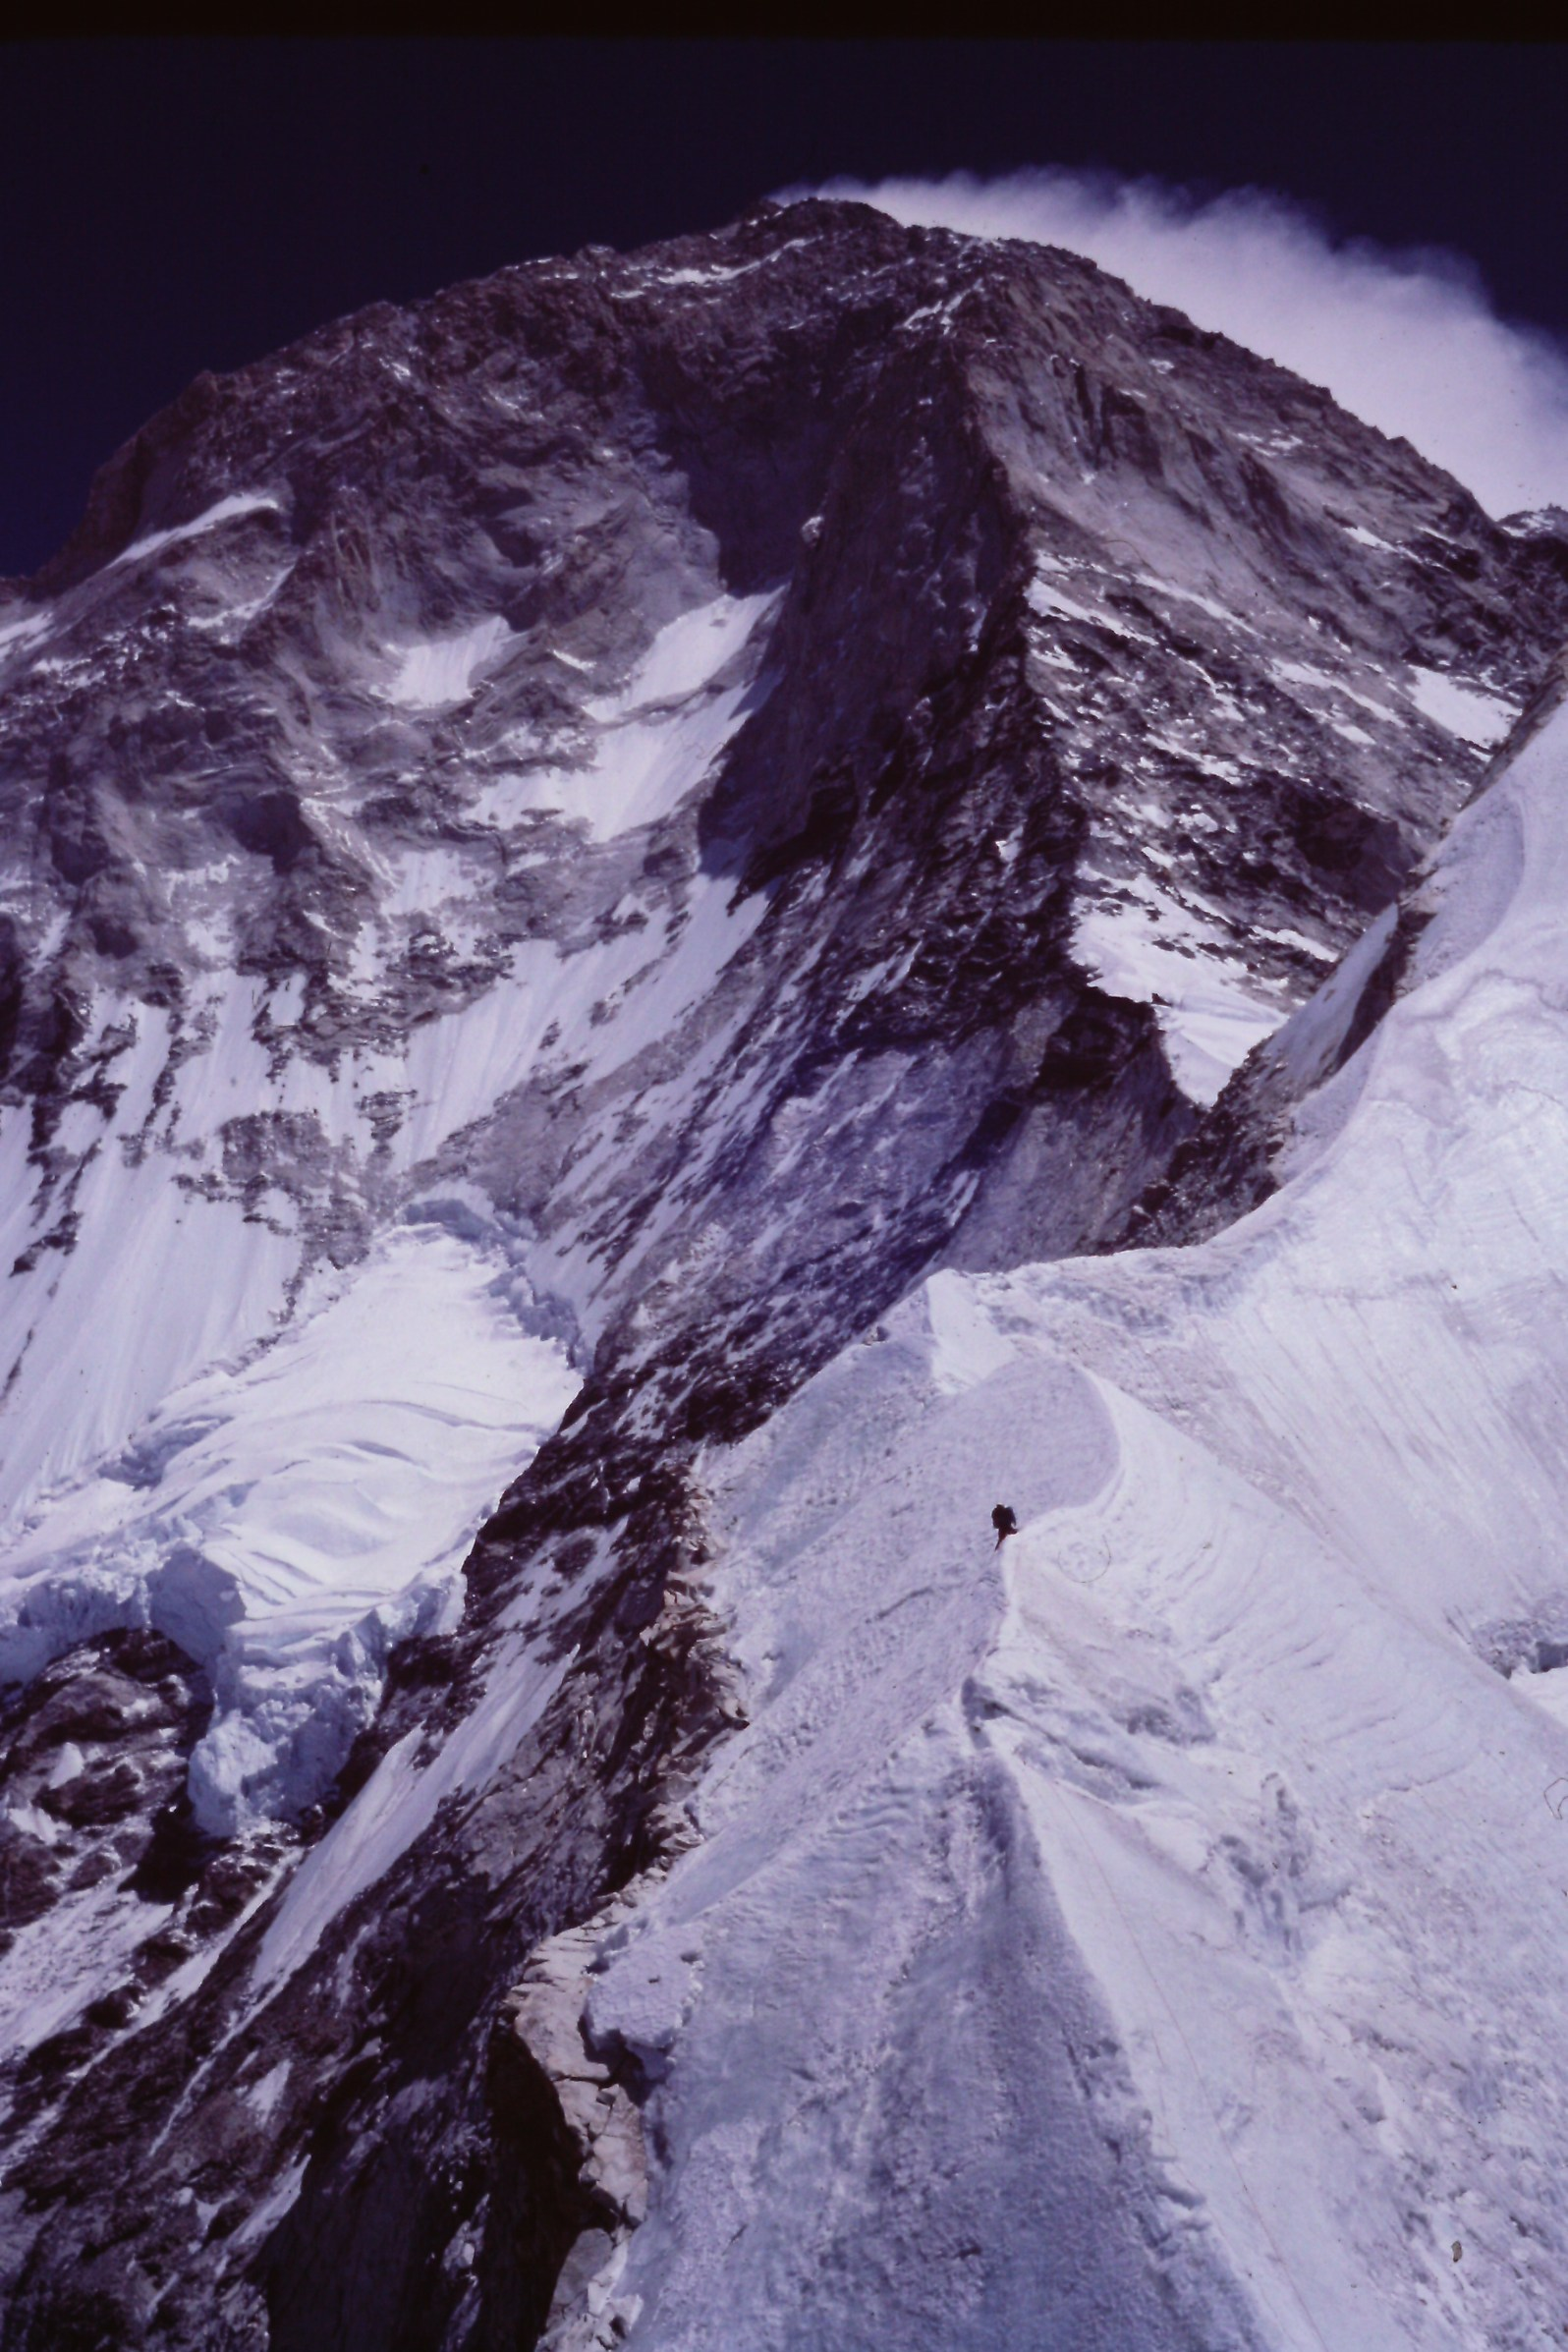 Climber on the